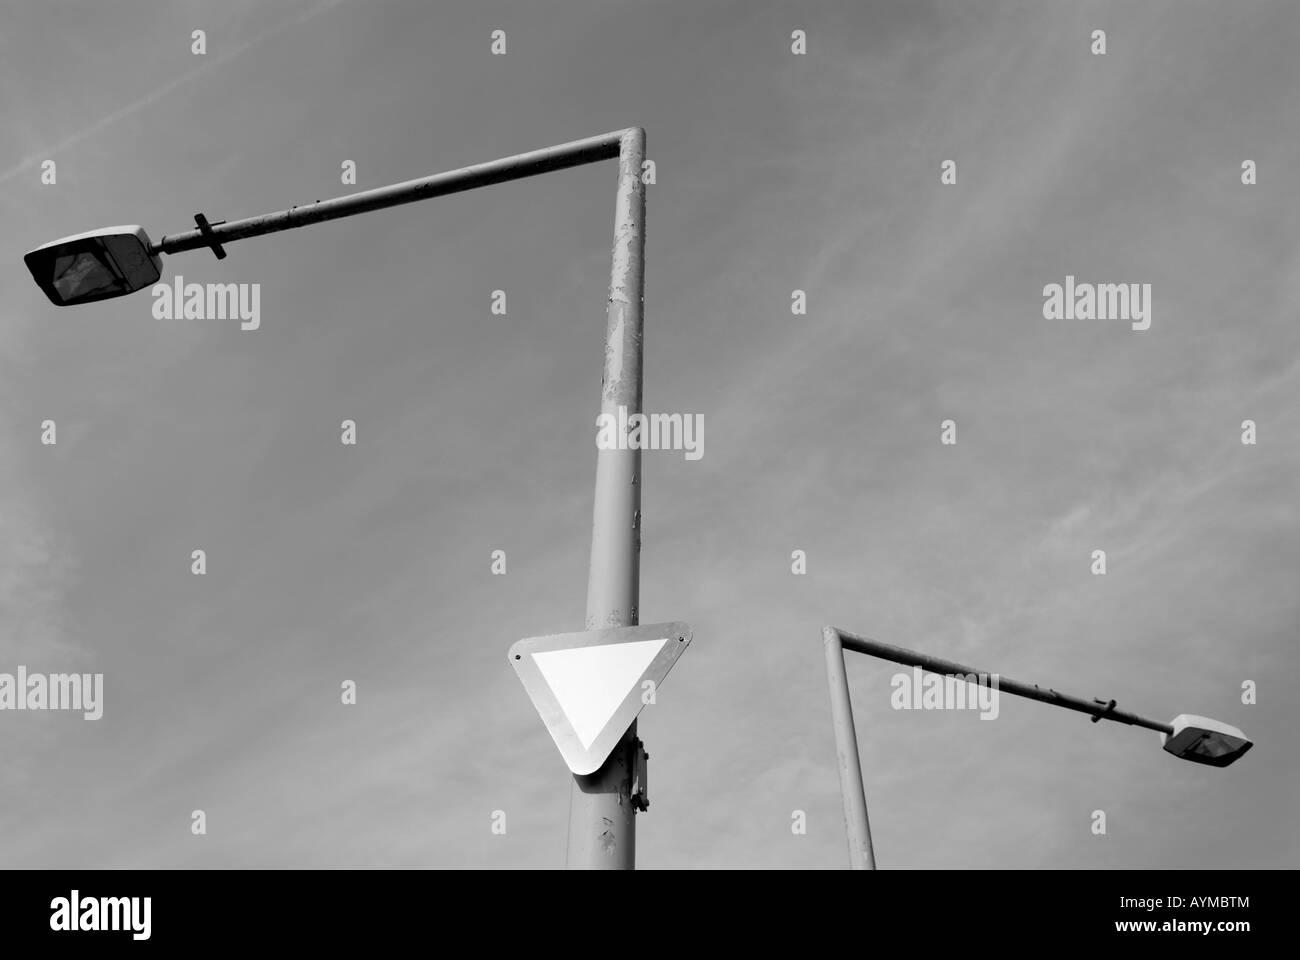 STREET LAMPS - Stock Image